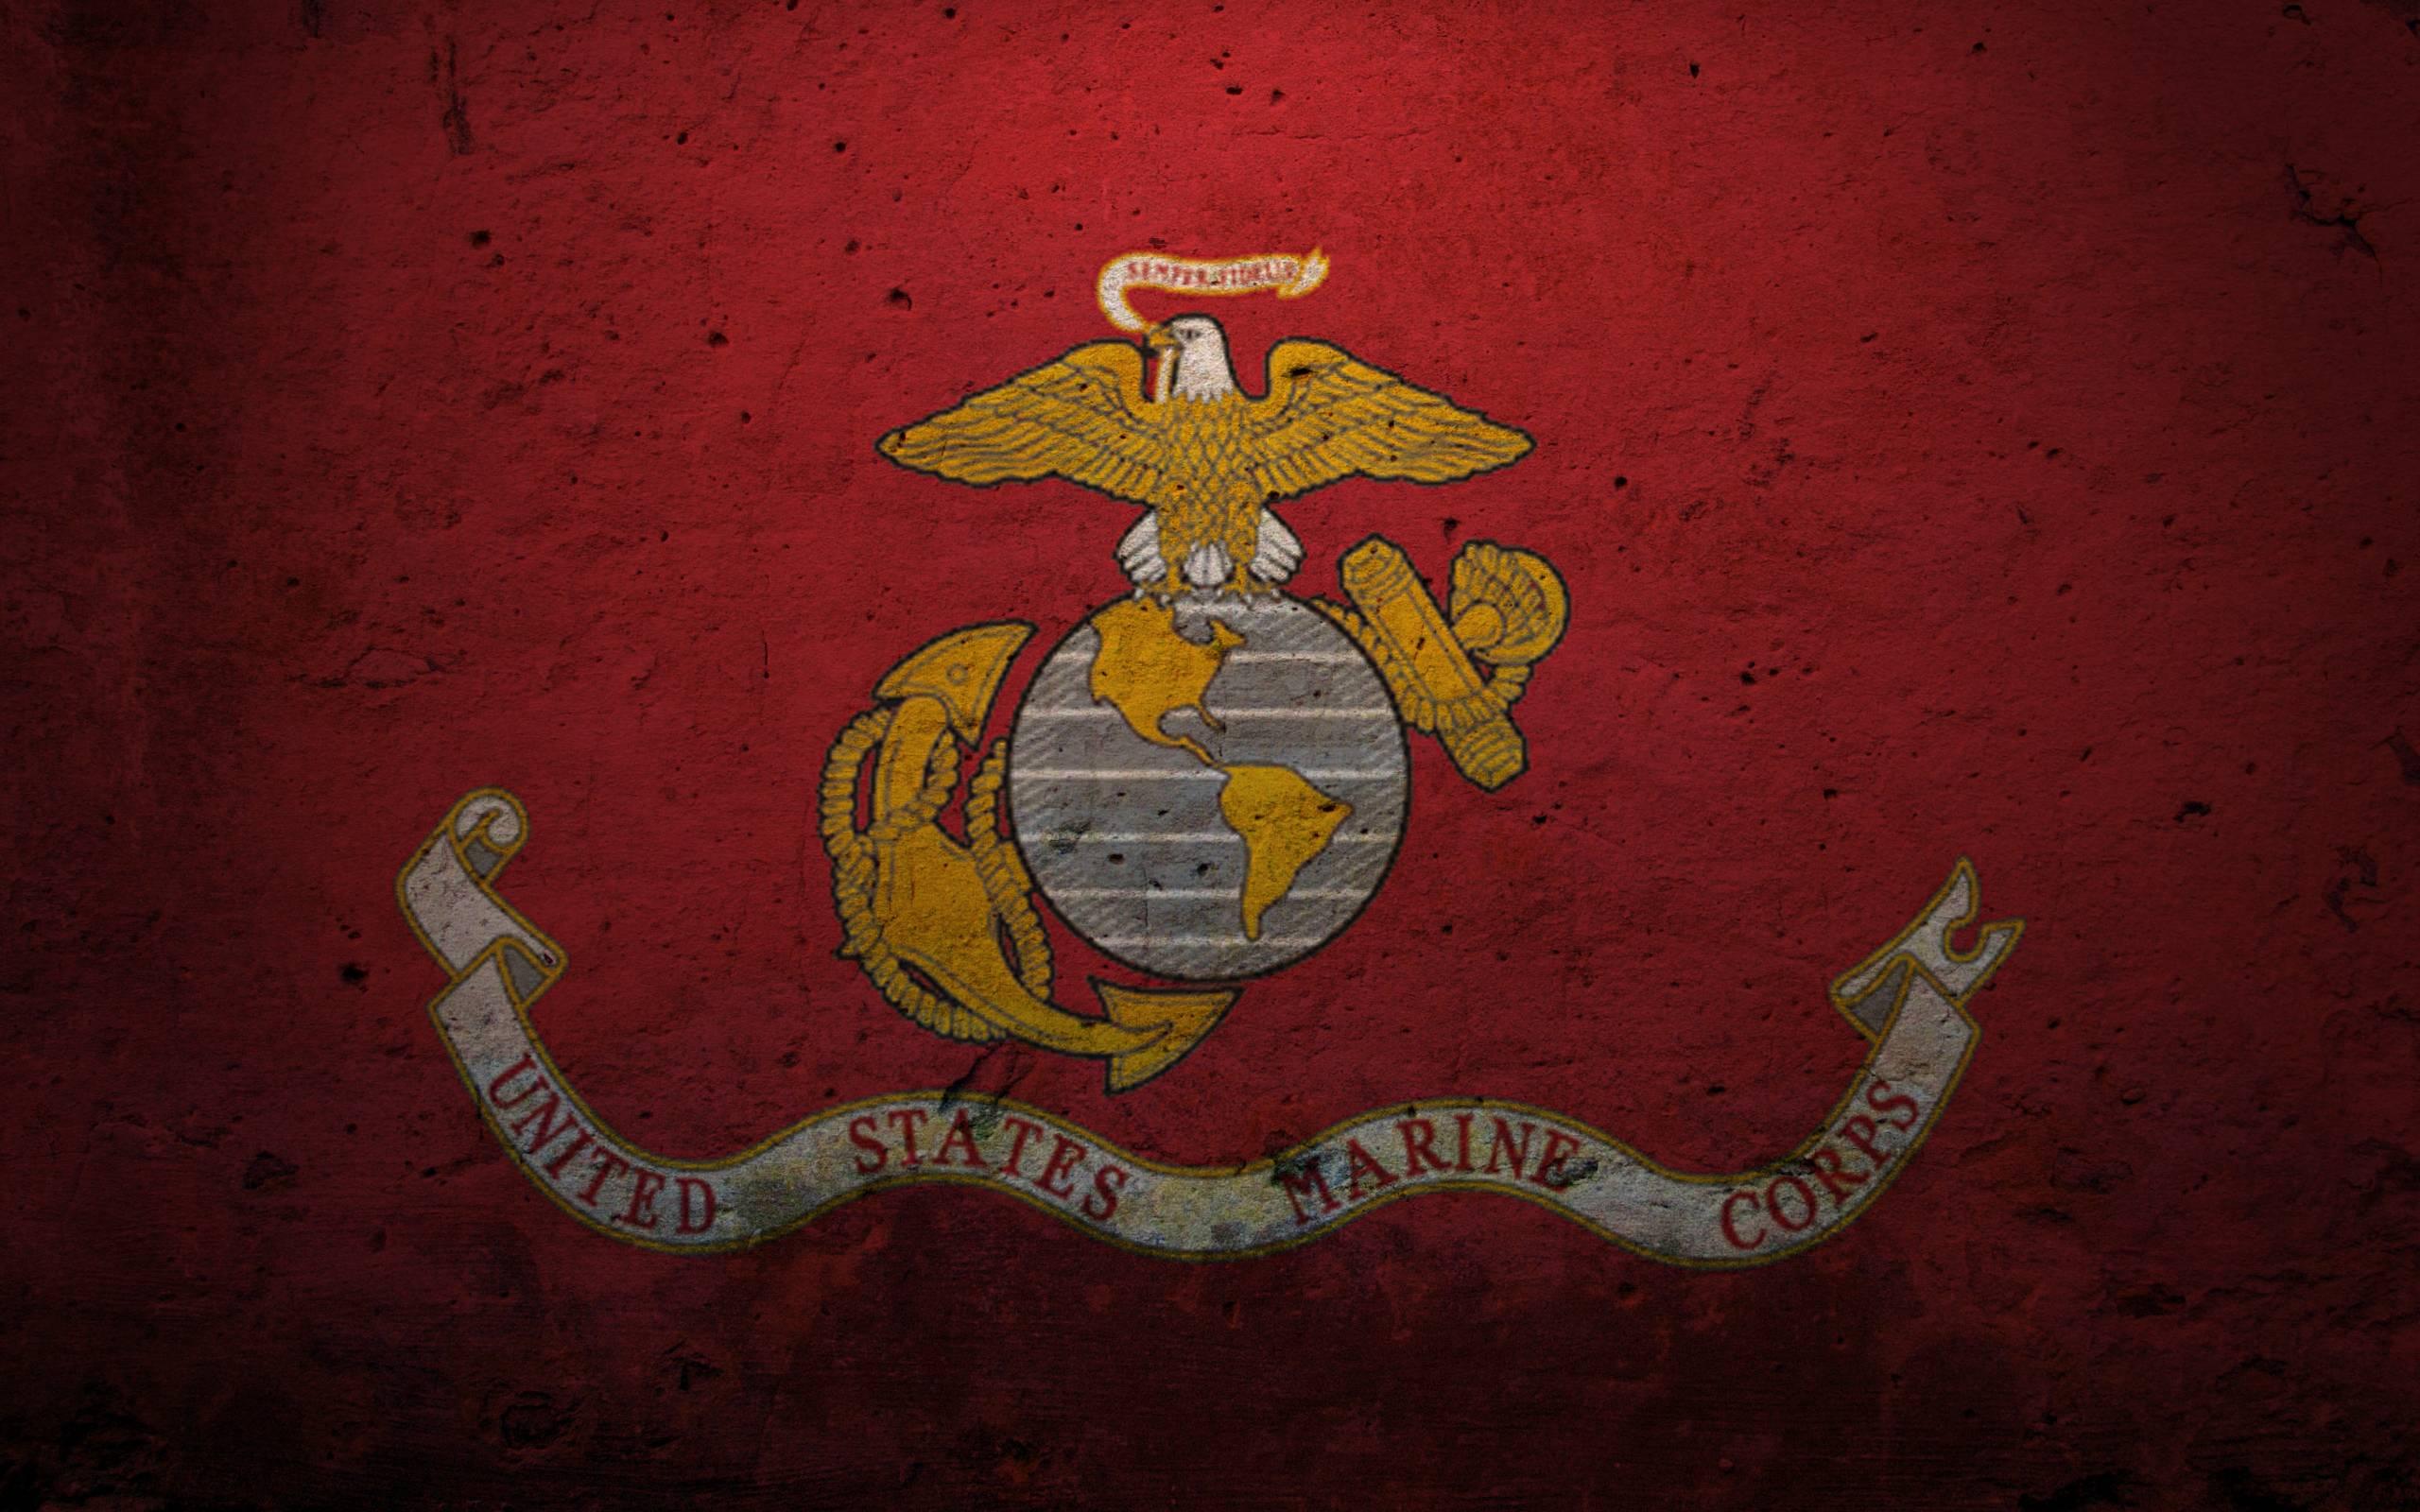 ... United States Marine Corp ...